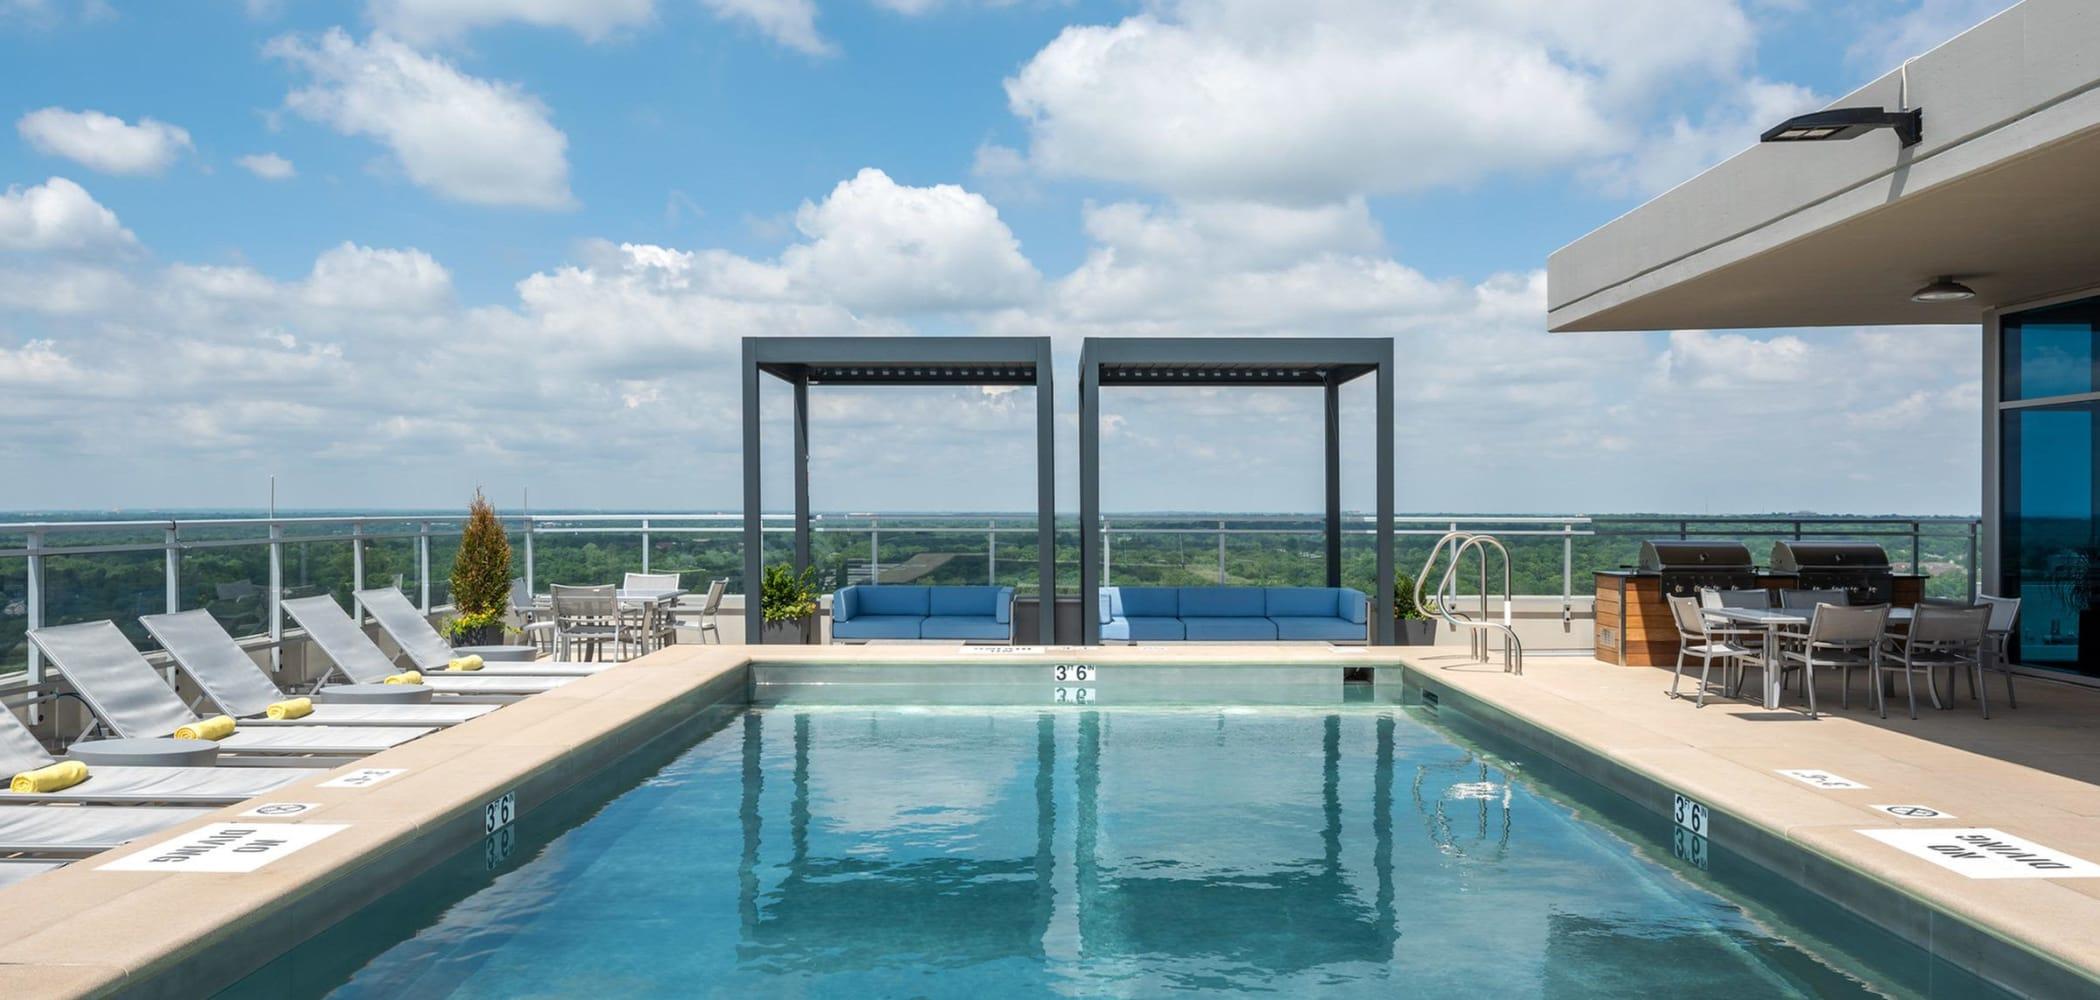 Swimming pool at Two Twelve Clayton in Clayton, Missouri